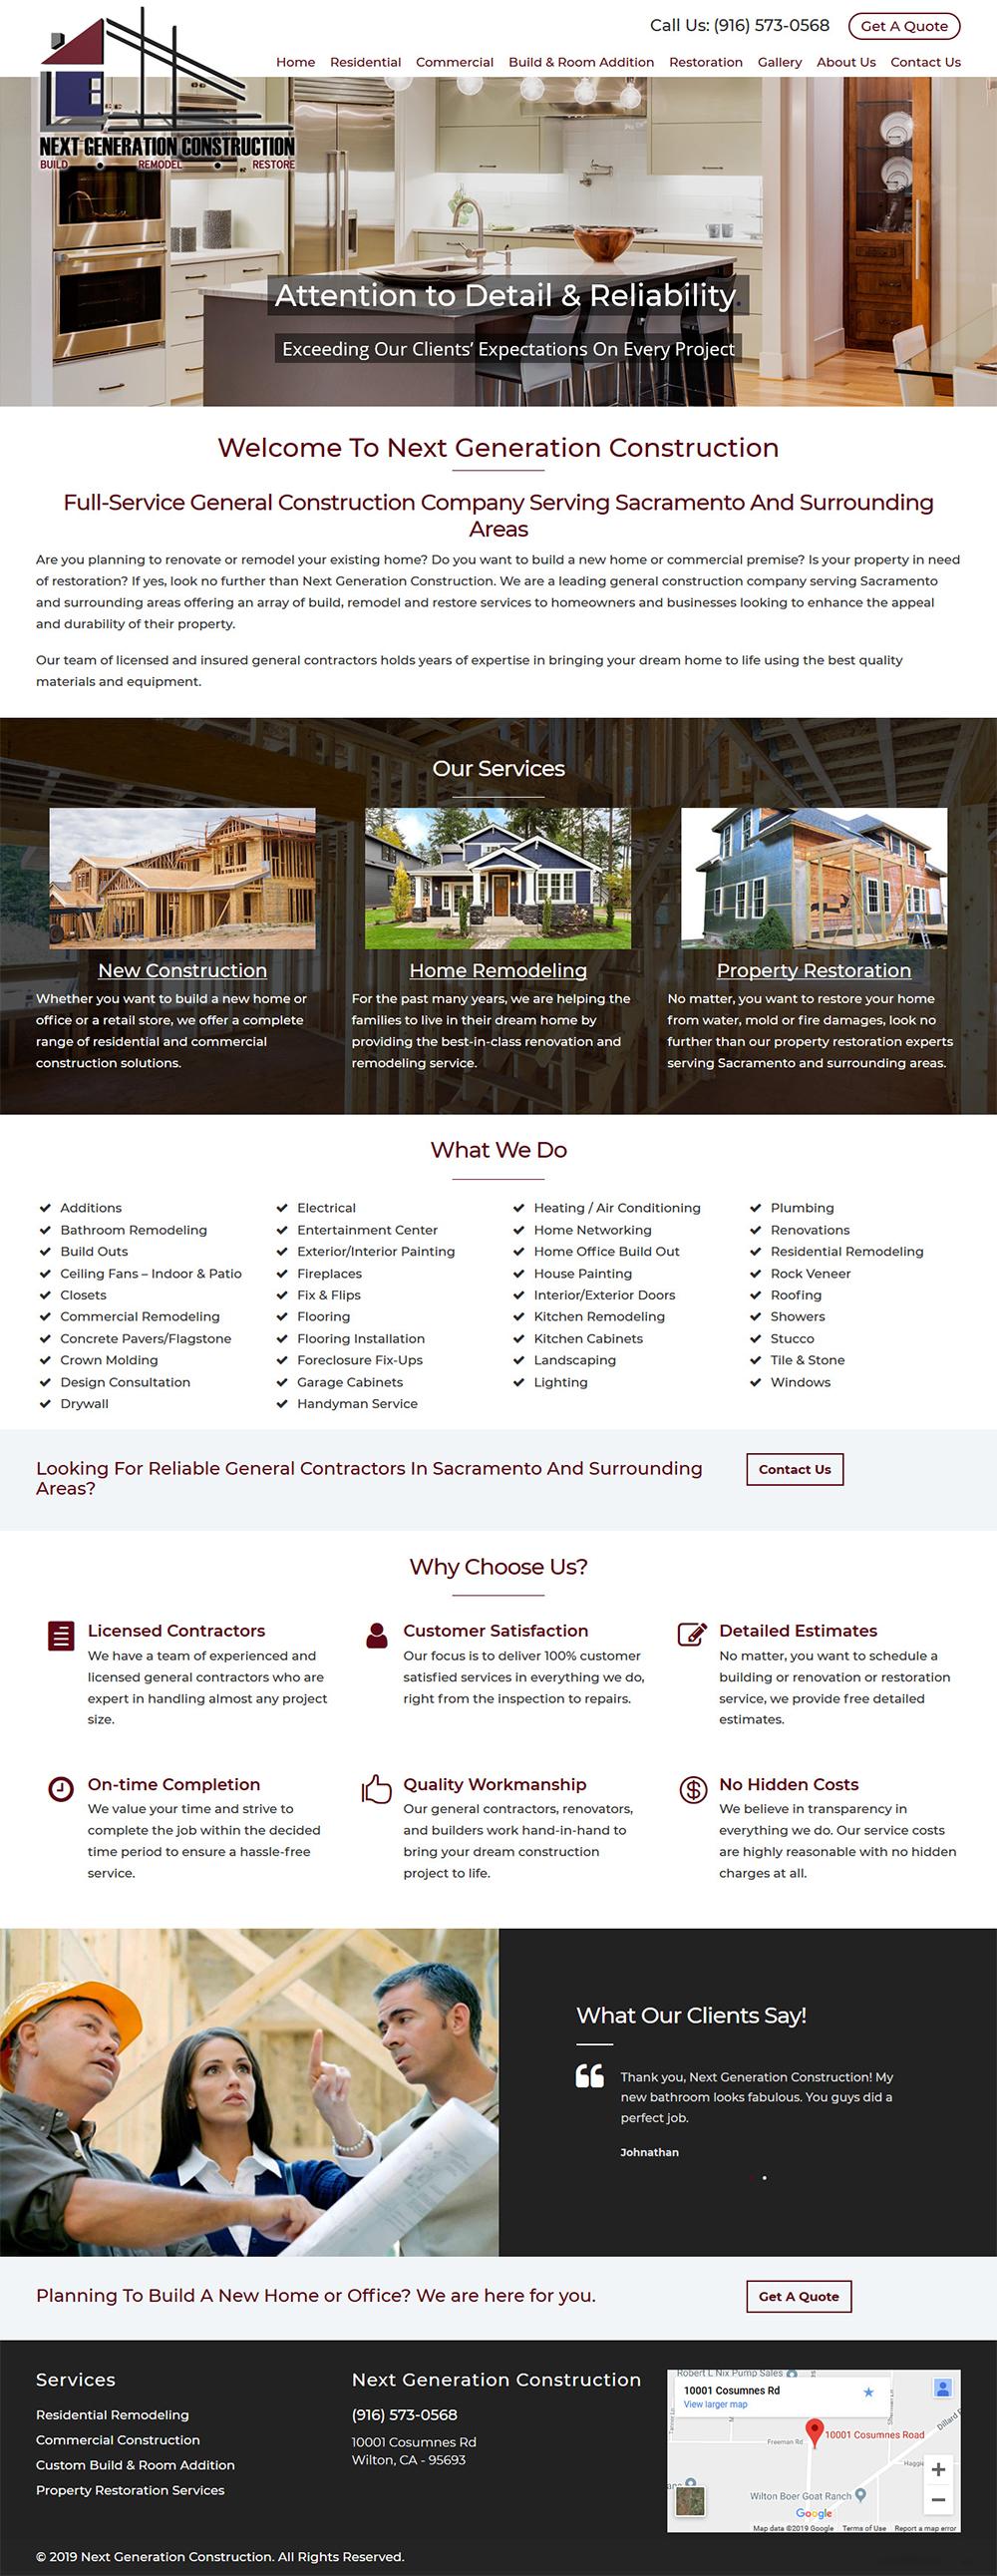 Web Design Portfolio San Francisco Bay Area Website Developer